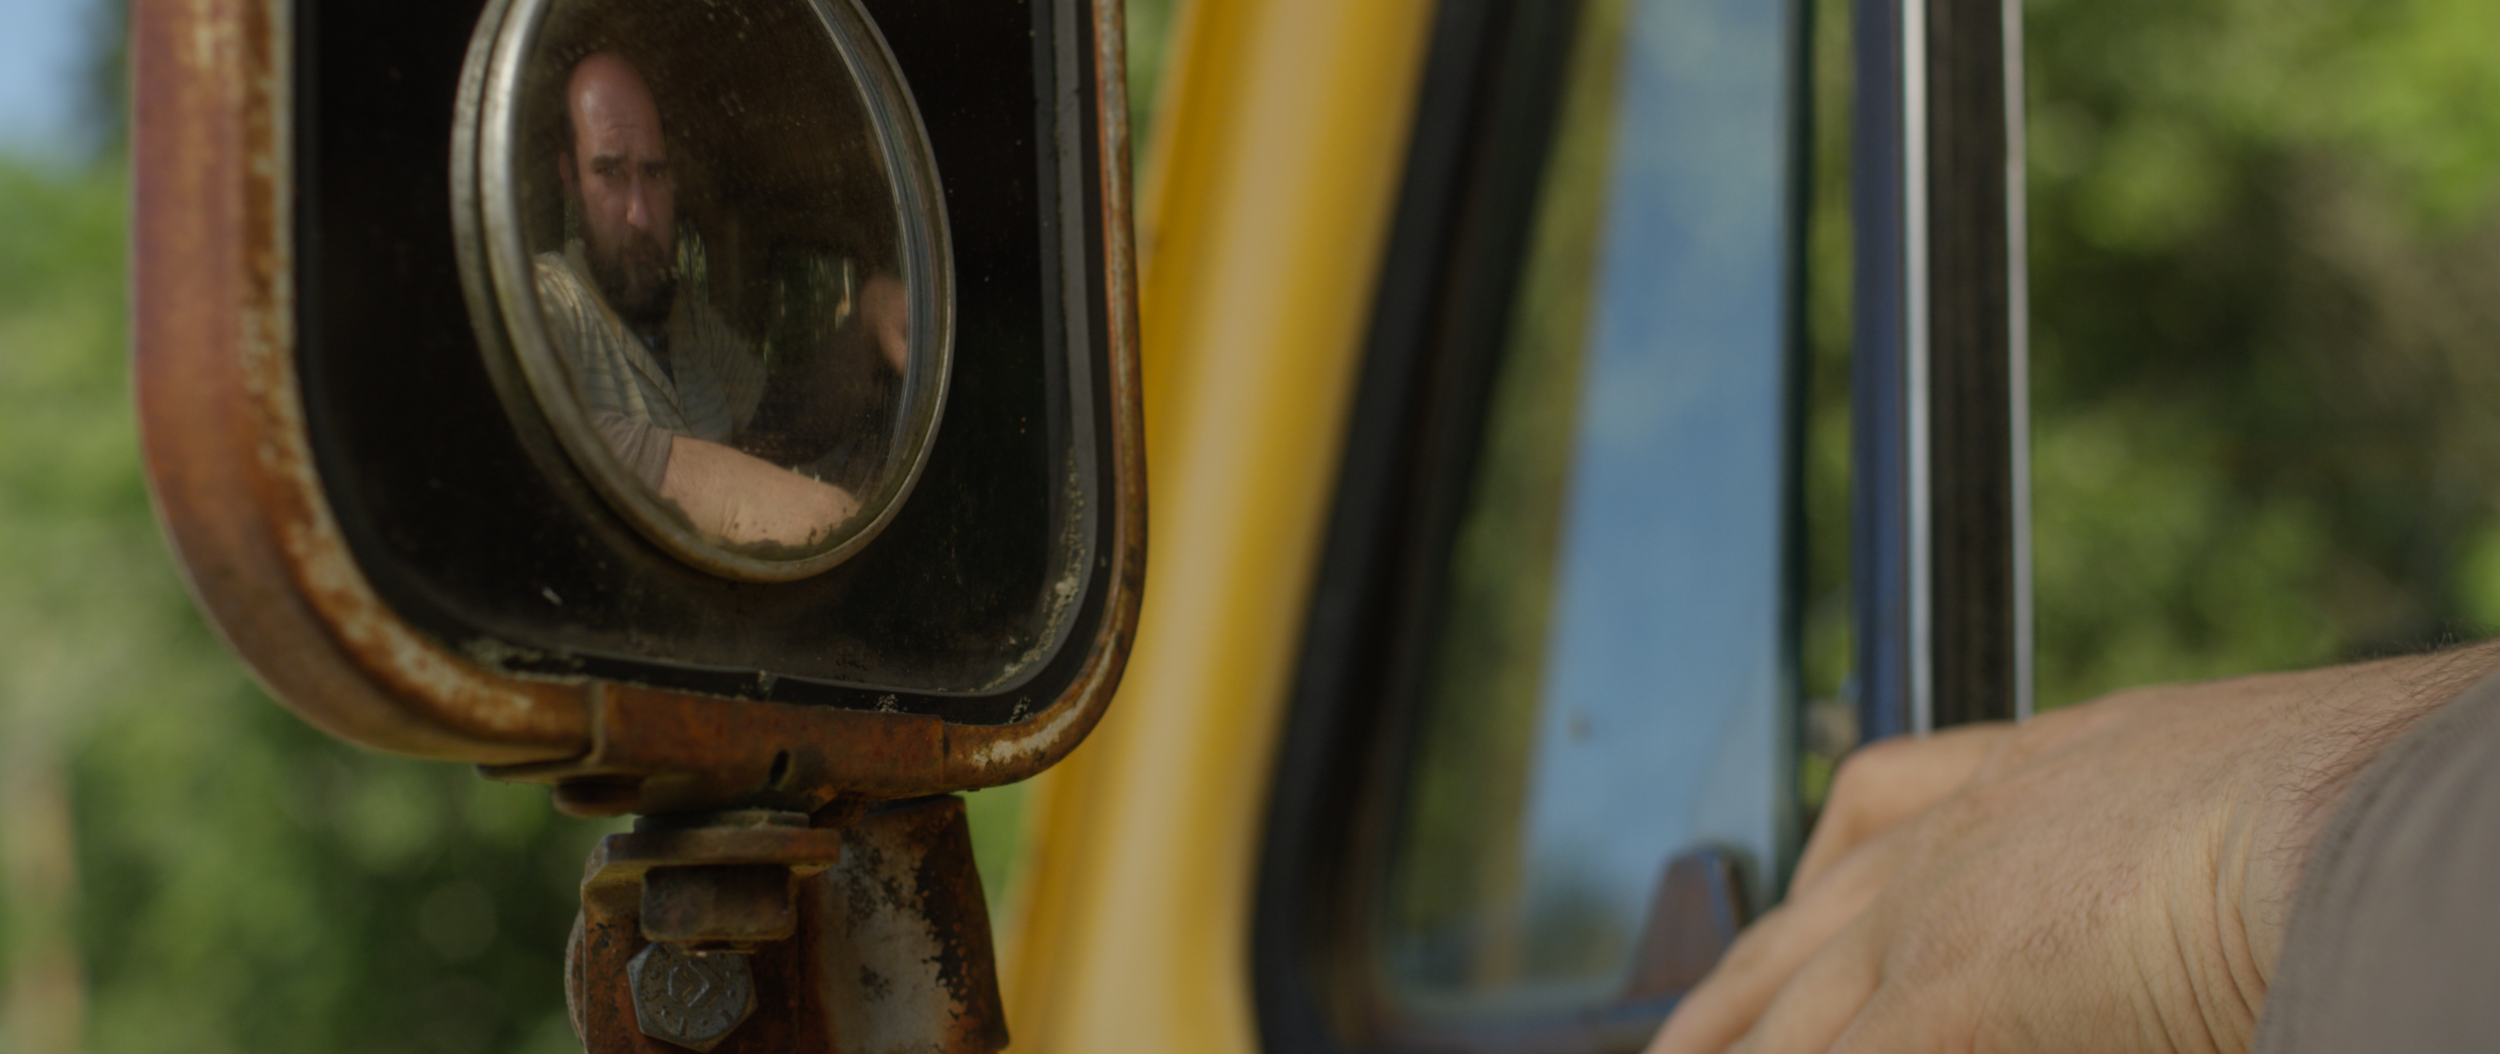 BLOOD BULLET - SHORT FILM - THRILLER   DIRECTOR: RONNIE ALLMAN   www.ronnieallman.com